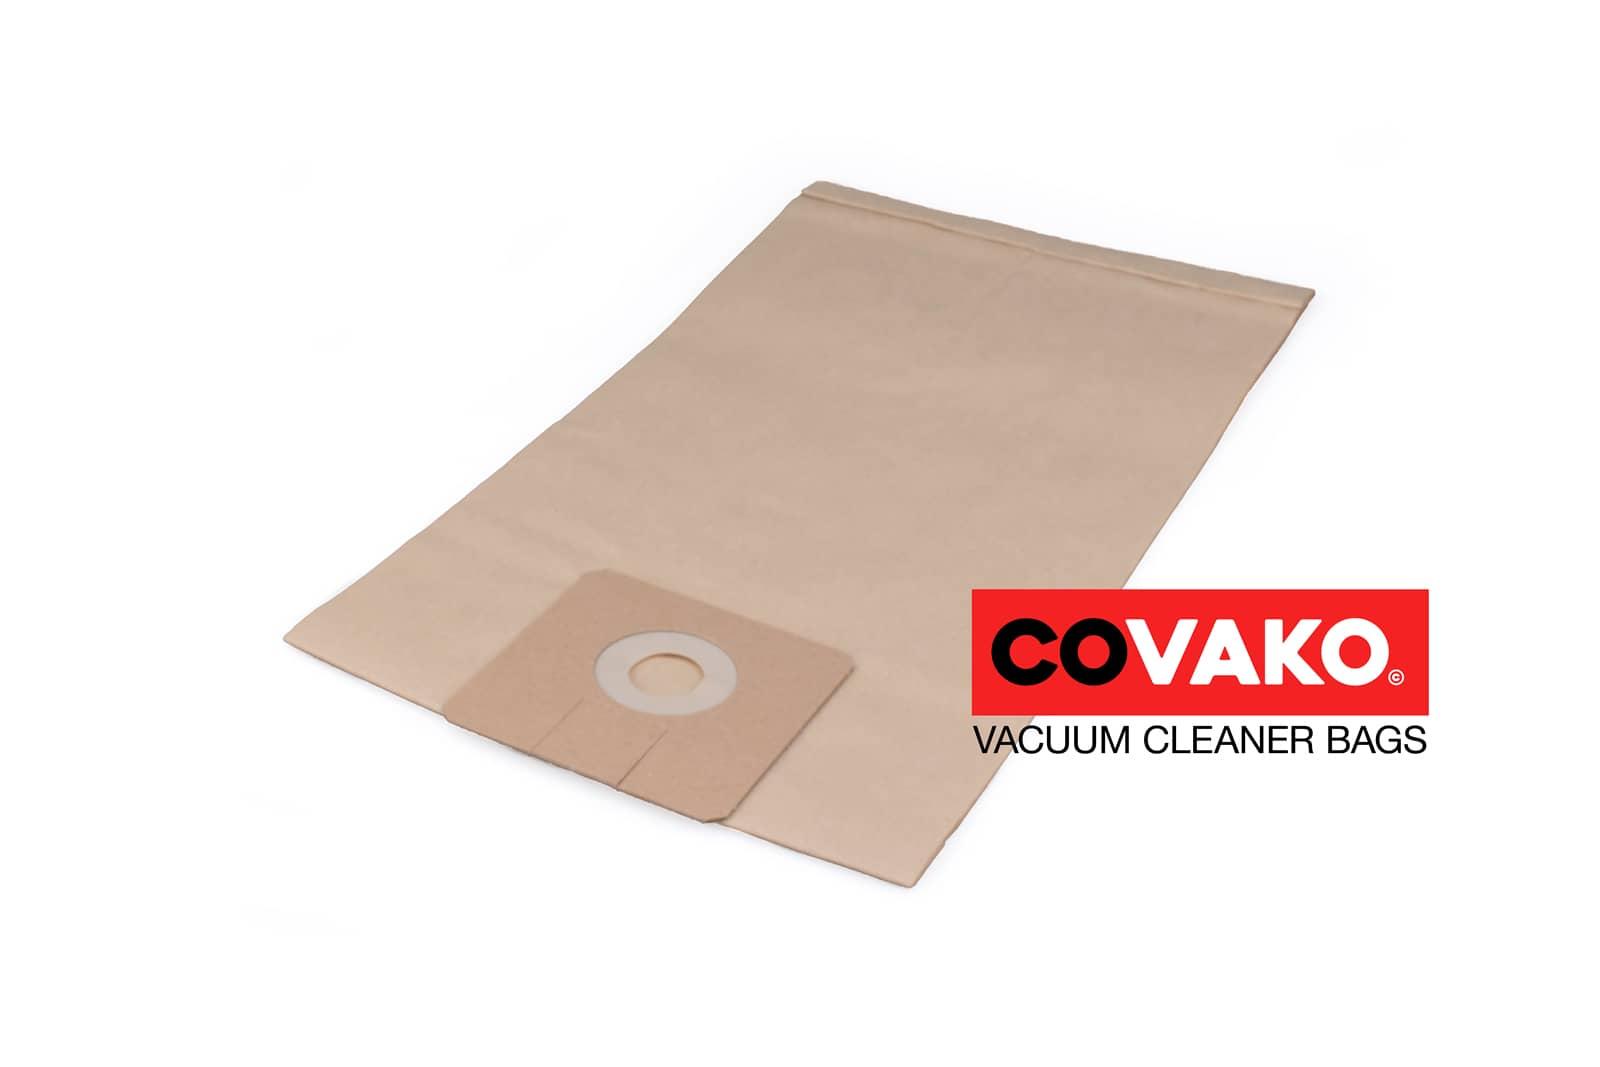 Sorma SM 115 / Papier - Sorma sacs d'aspirateur